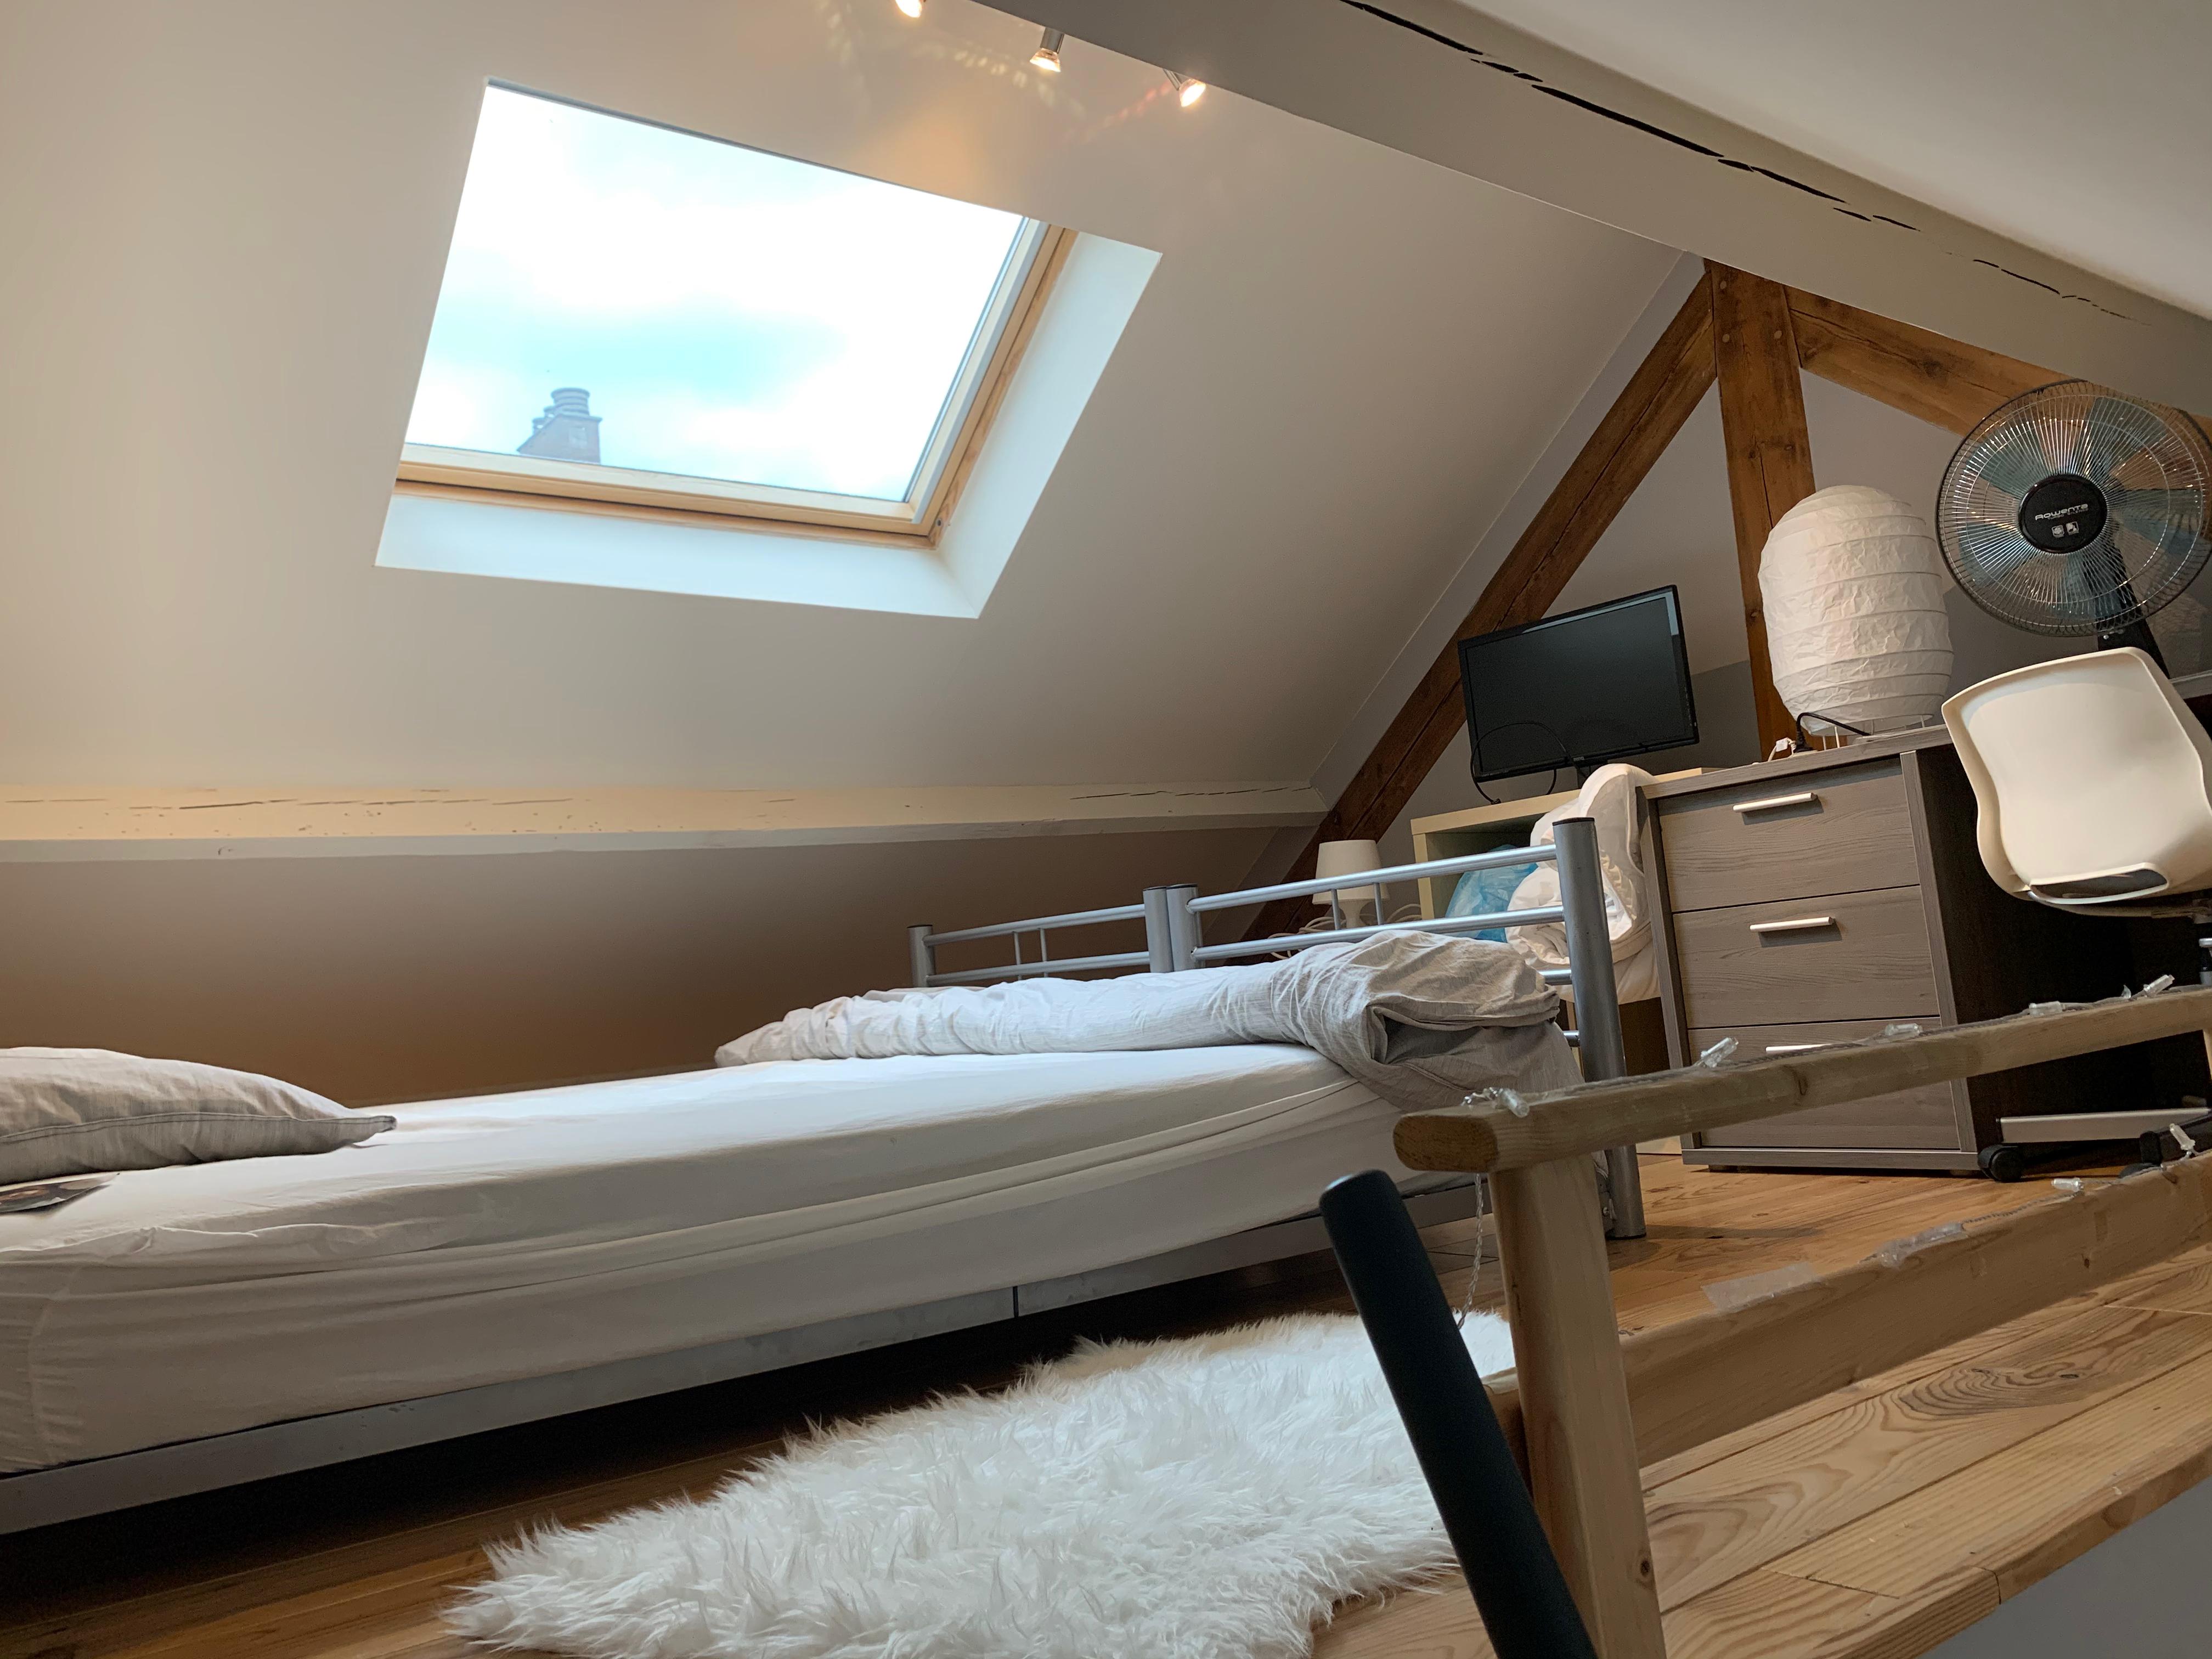 DB3-0301 - bed en bureau onder dak